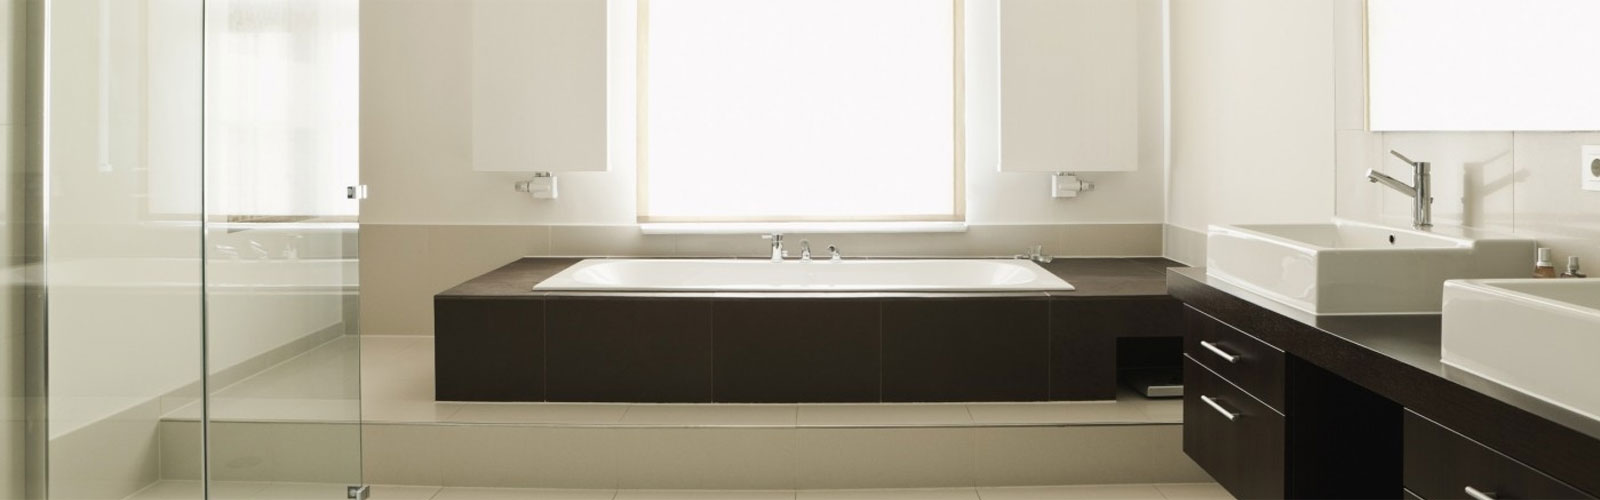 Calgary Bathworks | Calgary Bathroom Renovations